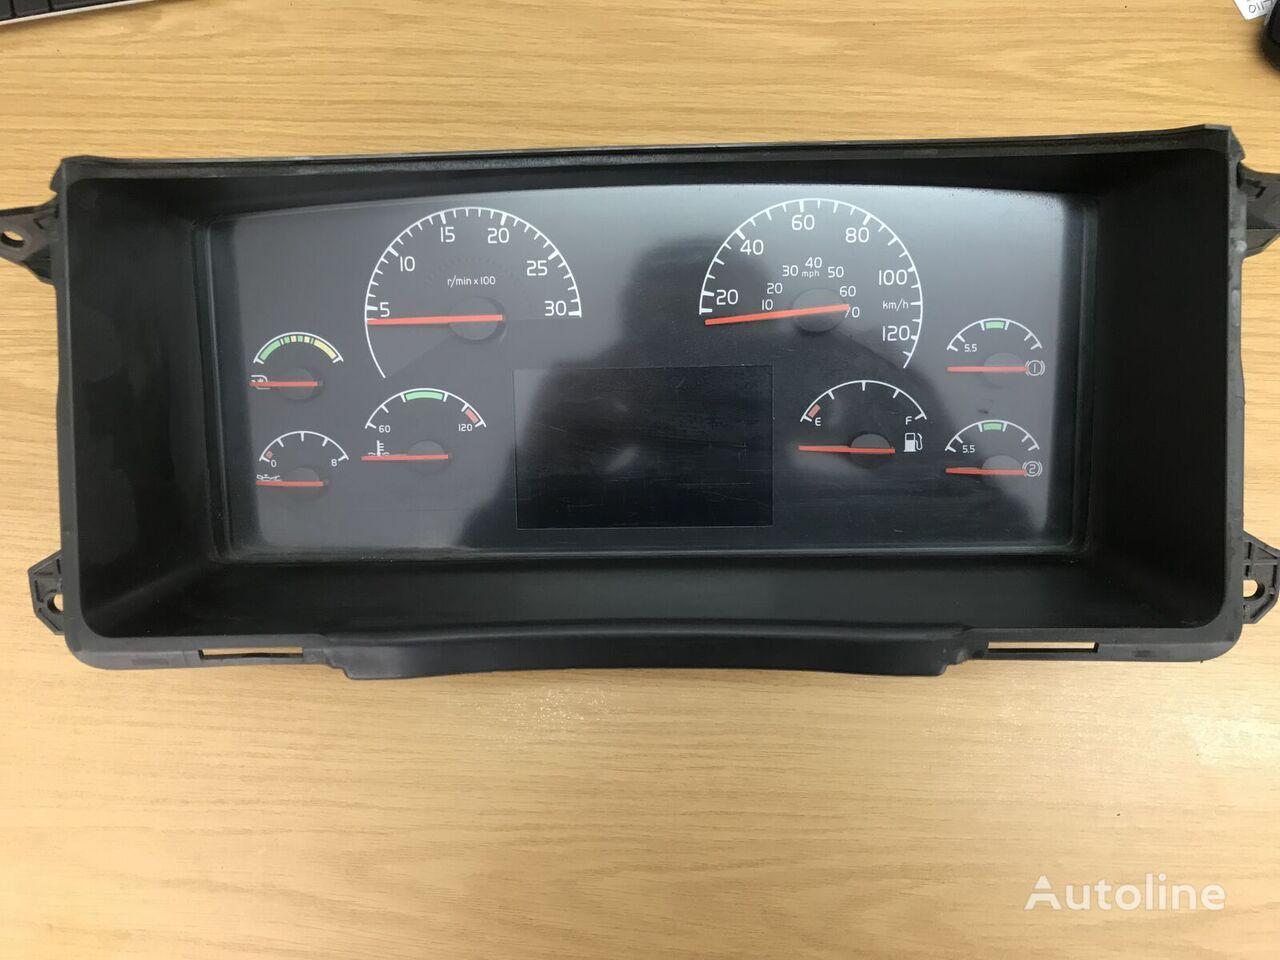 VOLVO Speedometer/Dash (20466984) dashboard for VOLVO FH/FM/FL truck